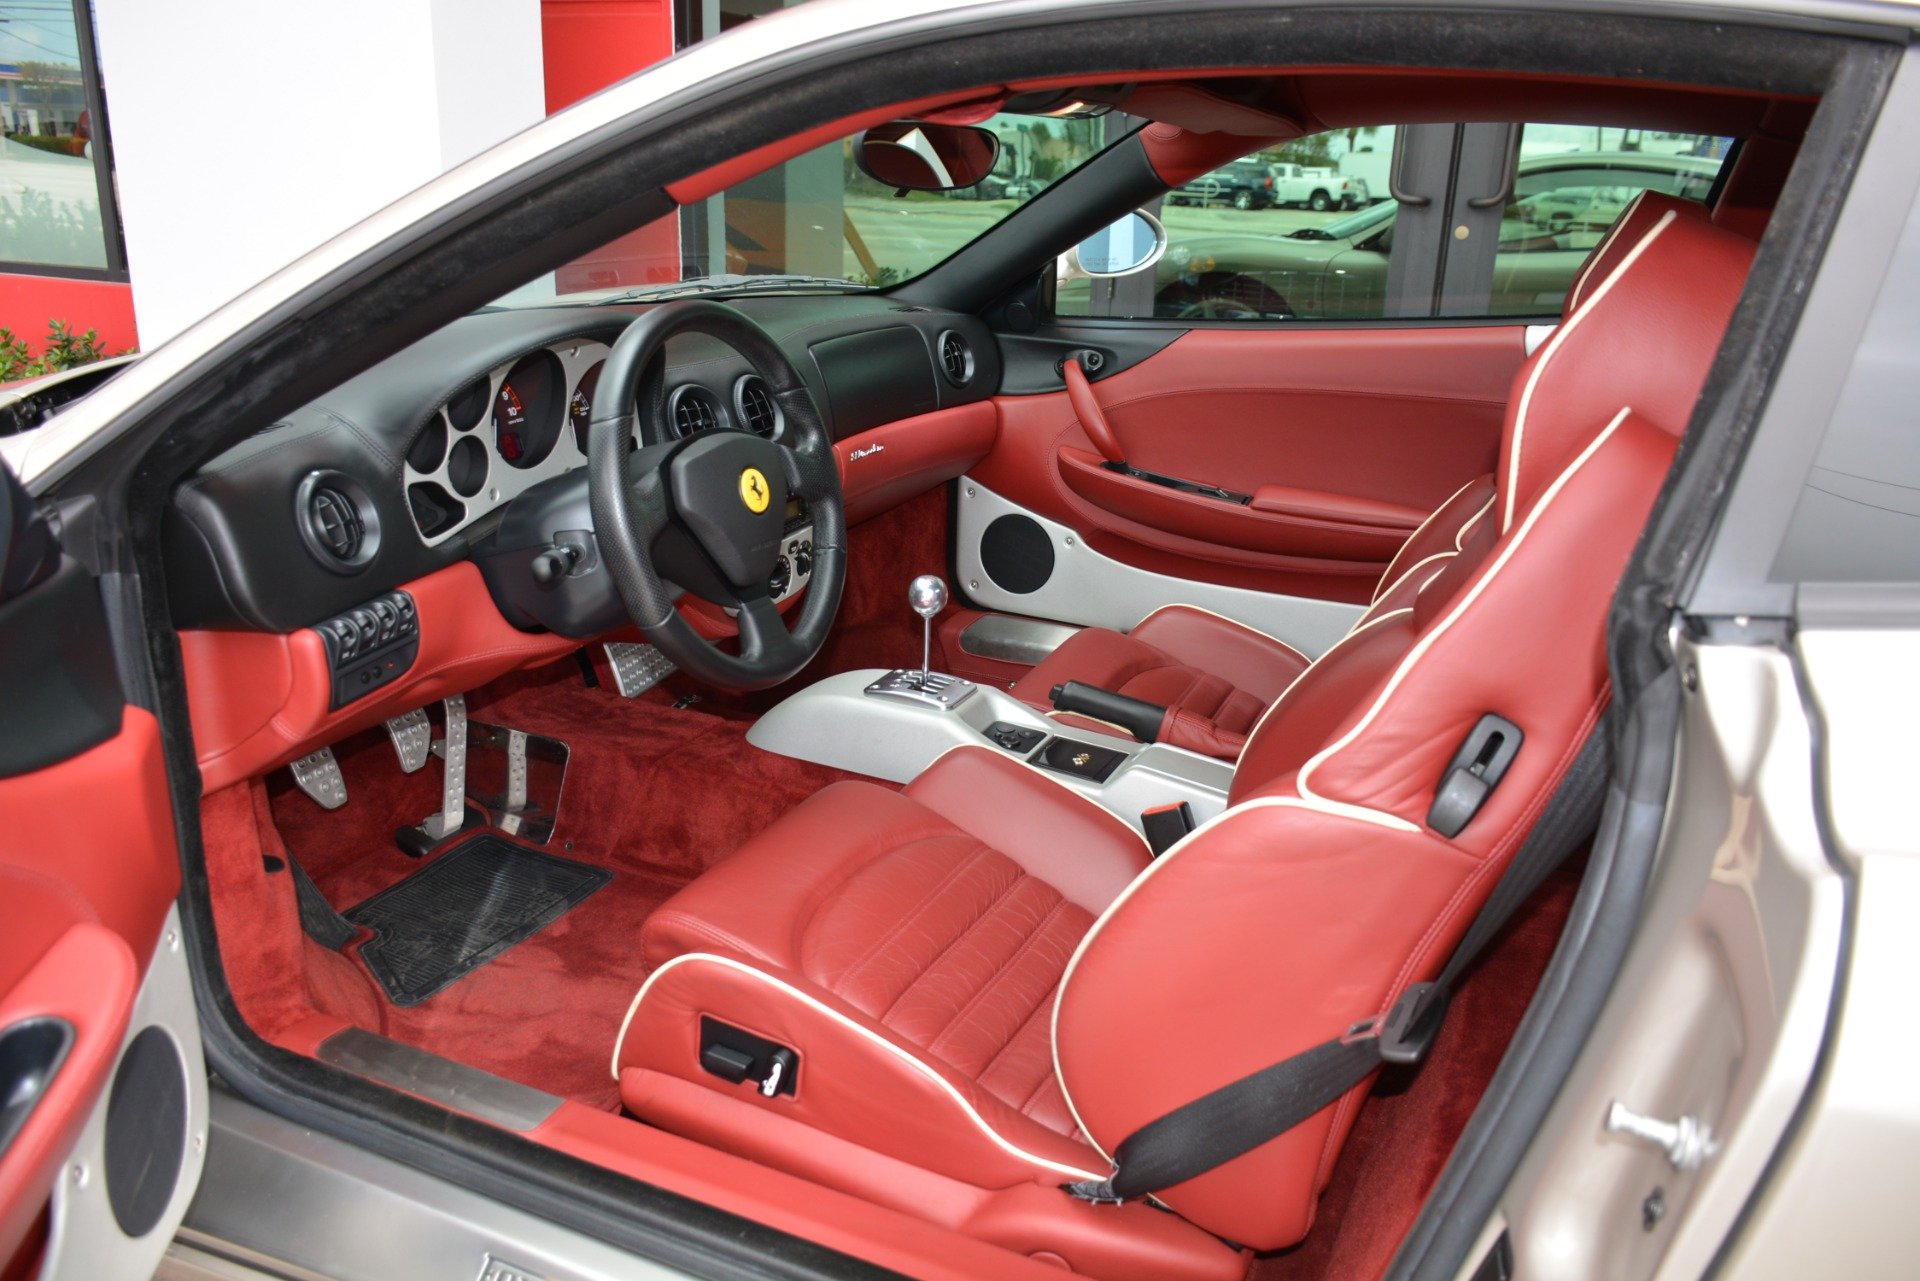 2003 Ferrari 360 Modena for sale in Bonita Springs, FL ... |Ferrari 360 Modena Interior